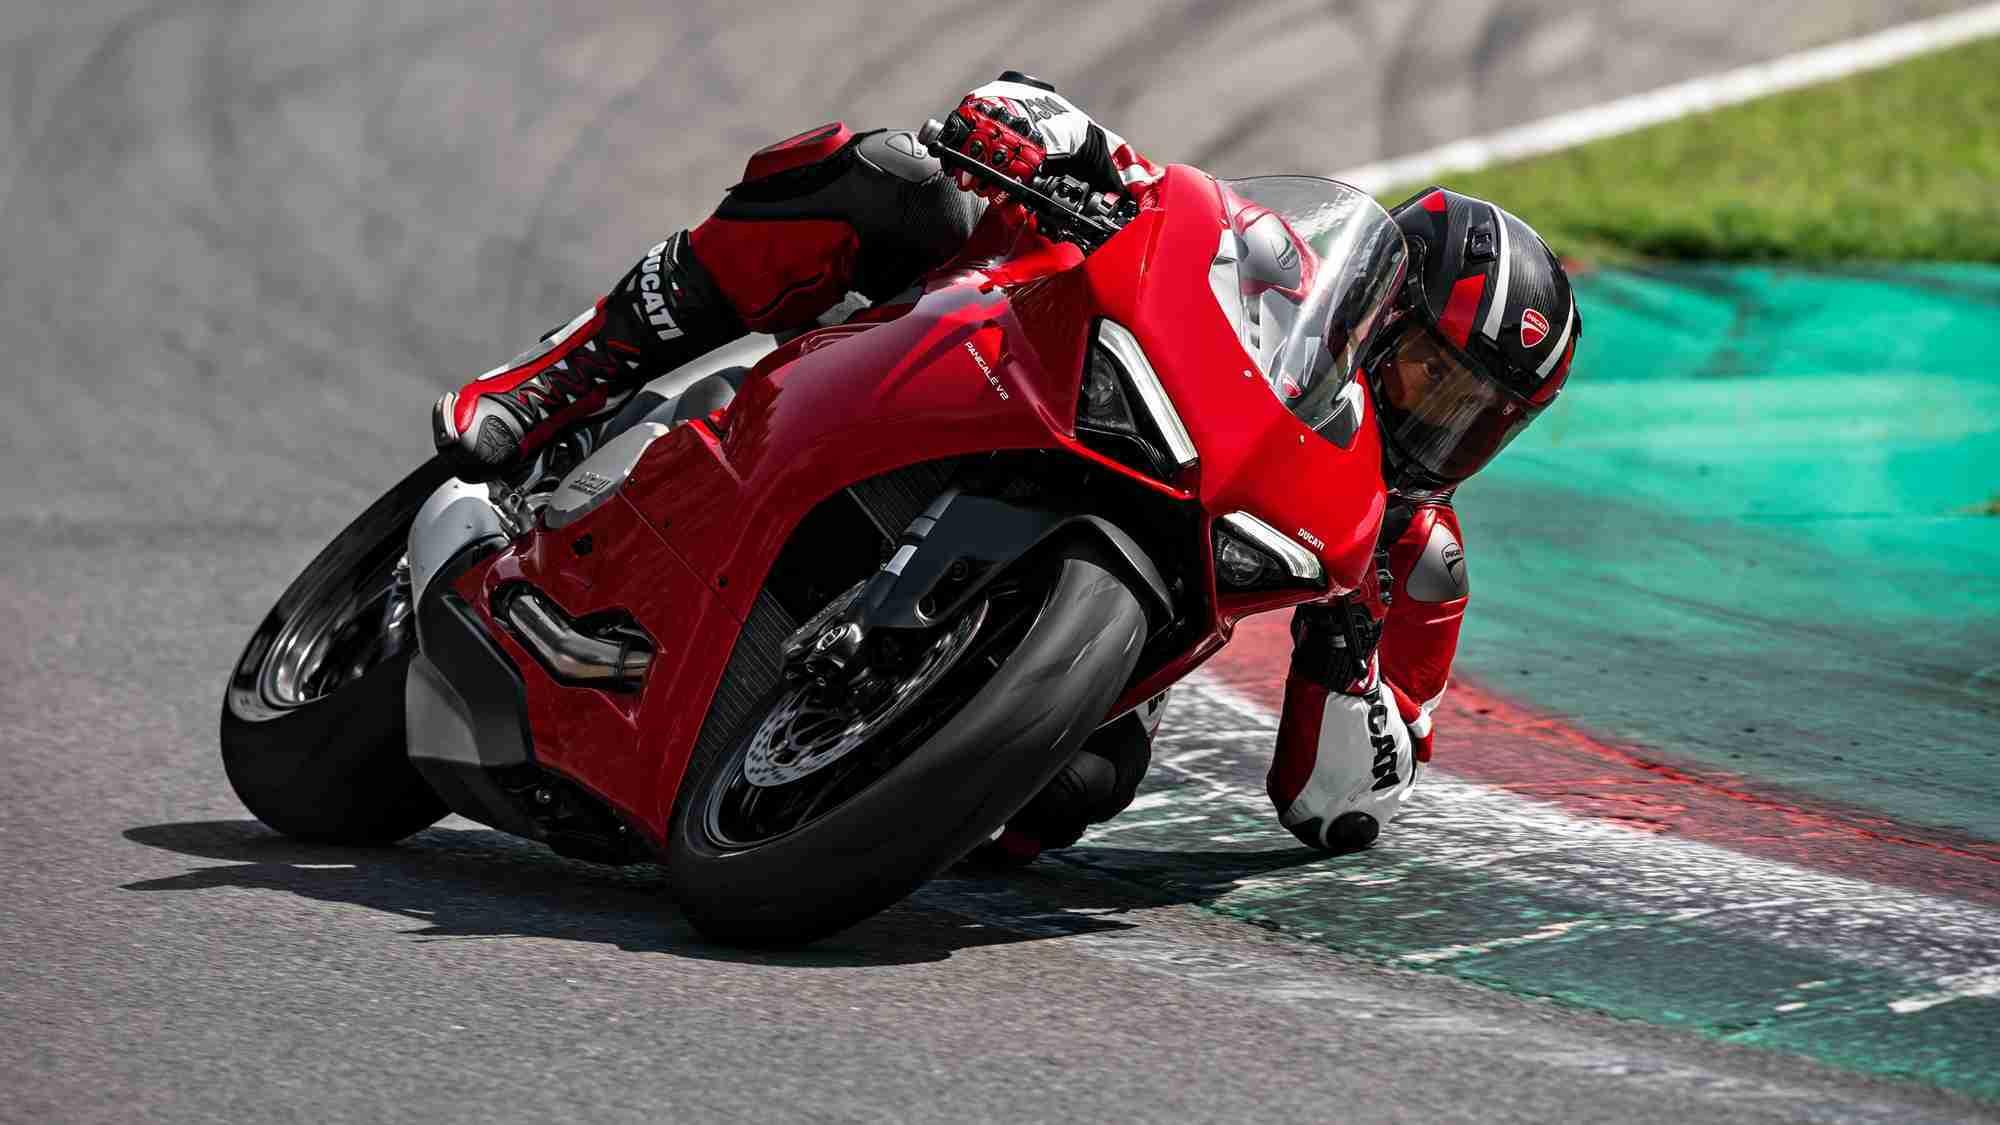 Ducati Panigale V2 HD wallpaper